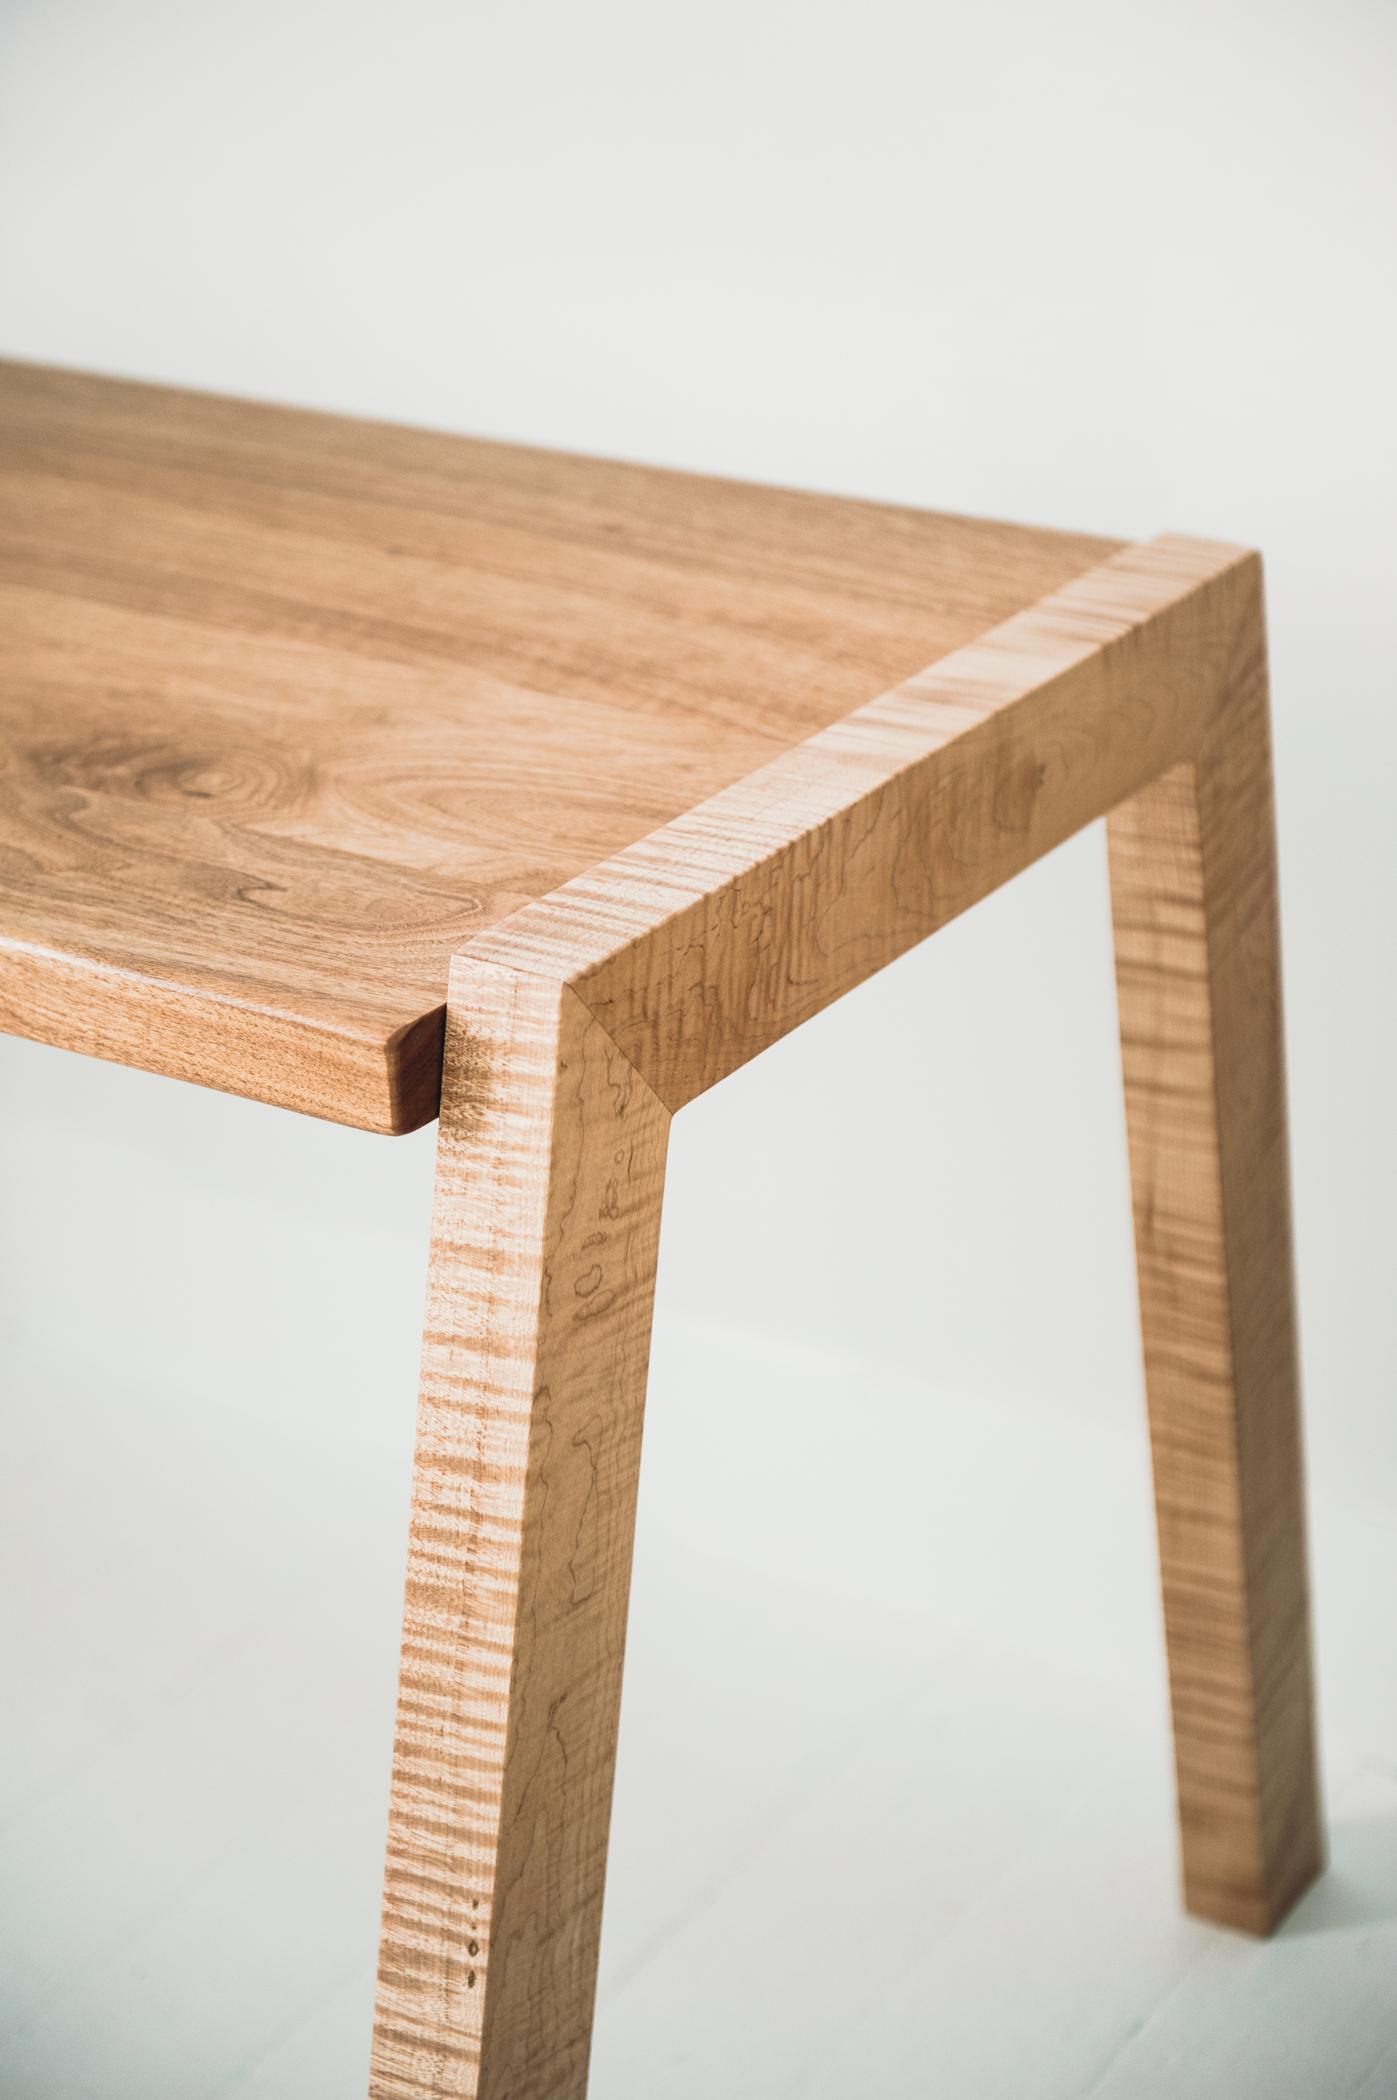 Maple and Butternut Desk